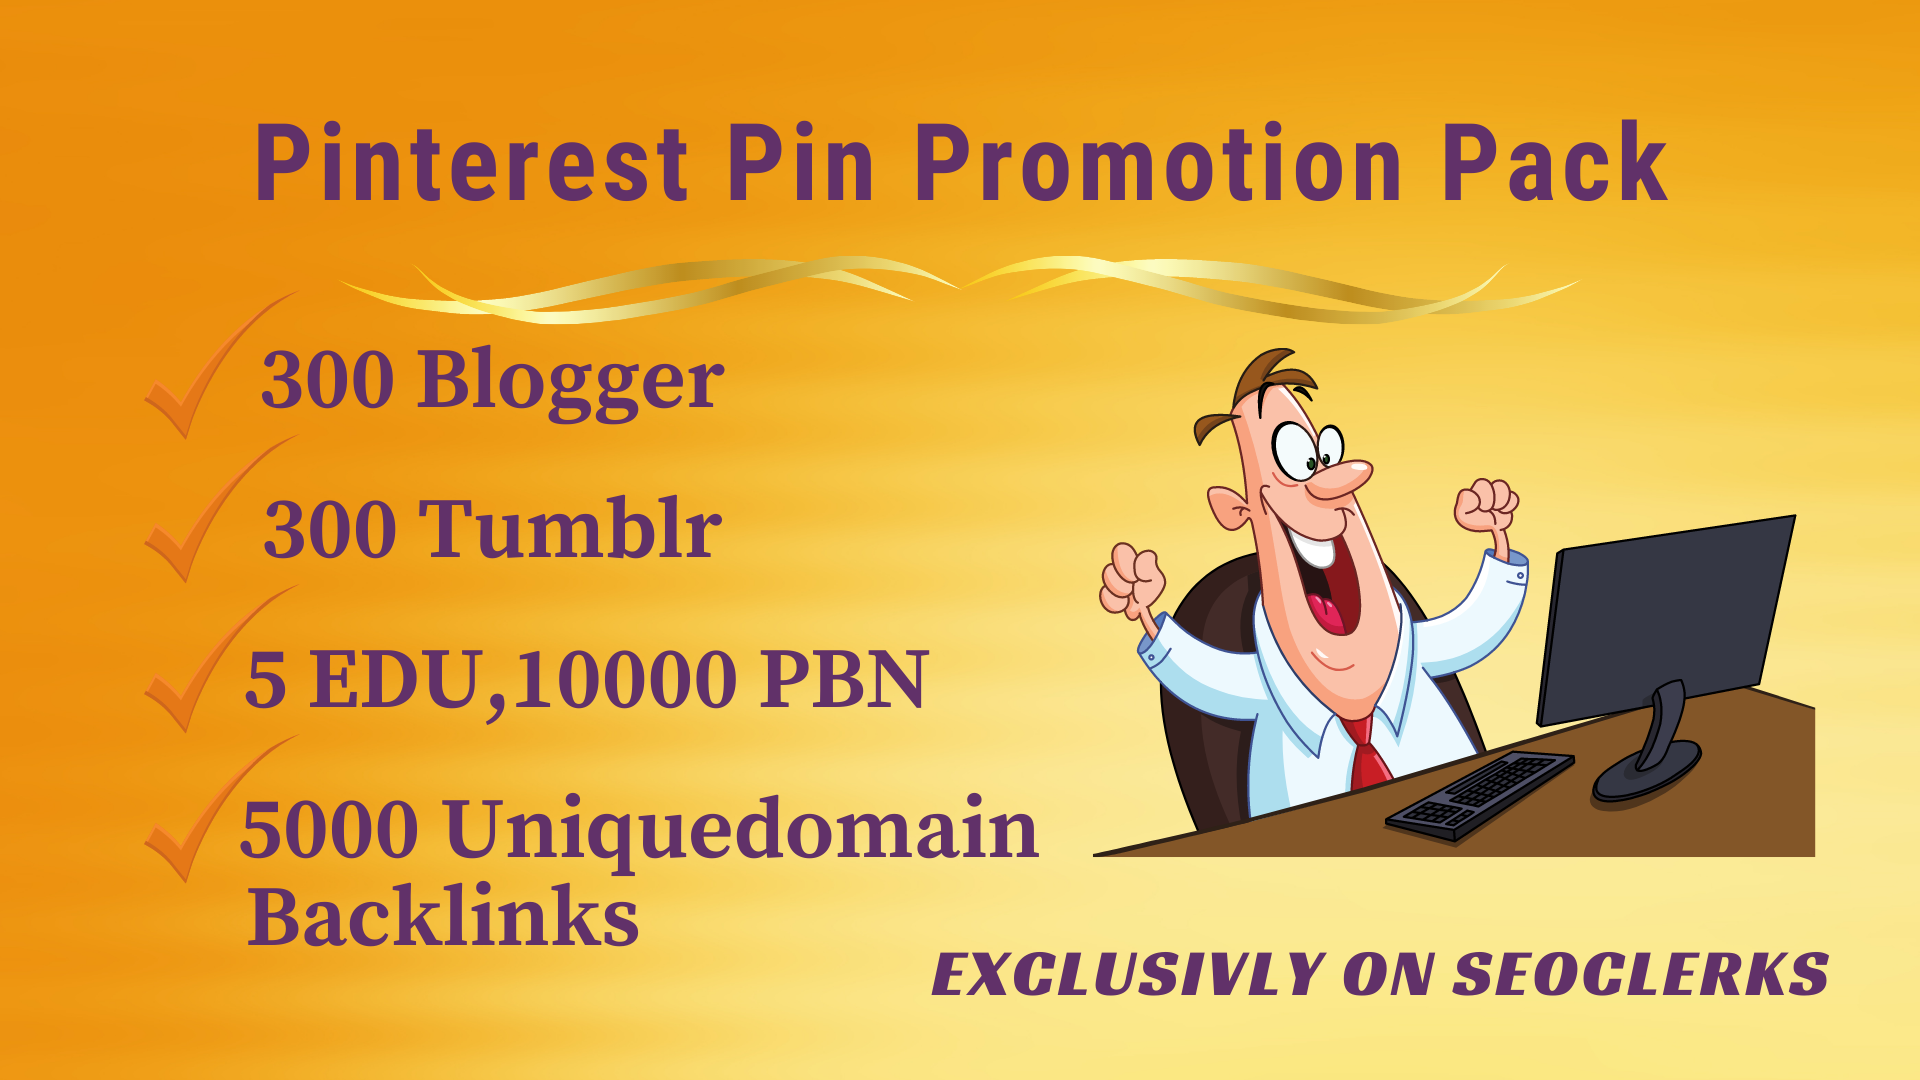 Pinterest Pin Promo pack -Get 5 EDU,  300 blogger,  300 tumblr,  10000 PBN,  5000 uniquedomain backlinks